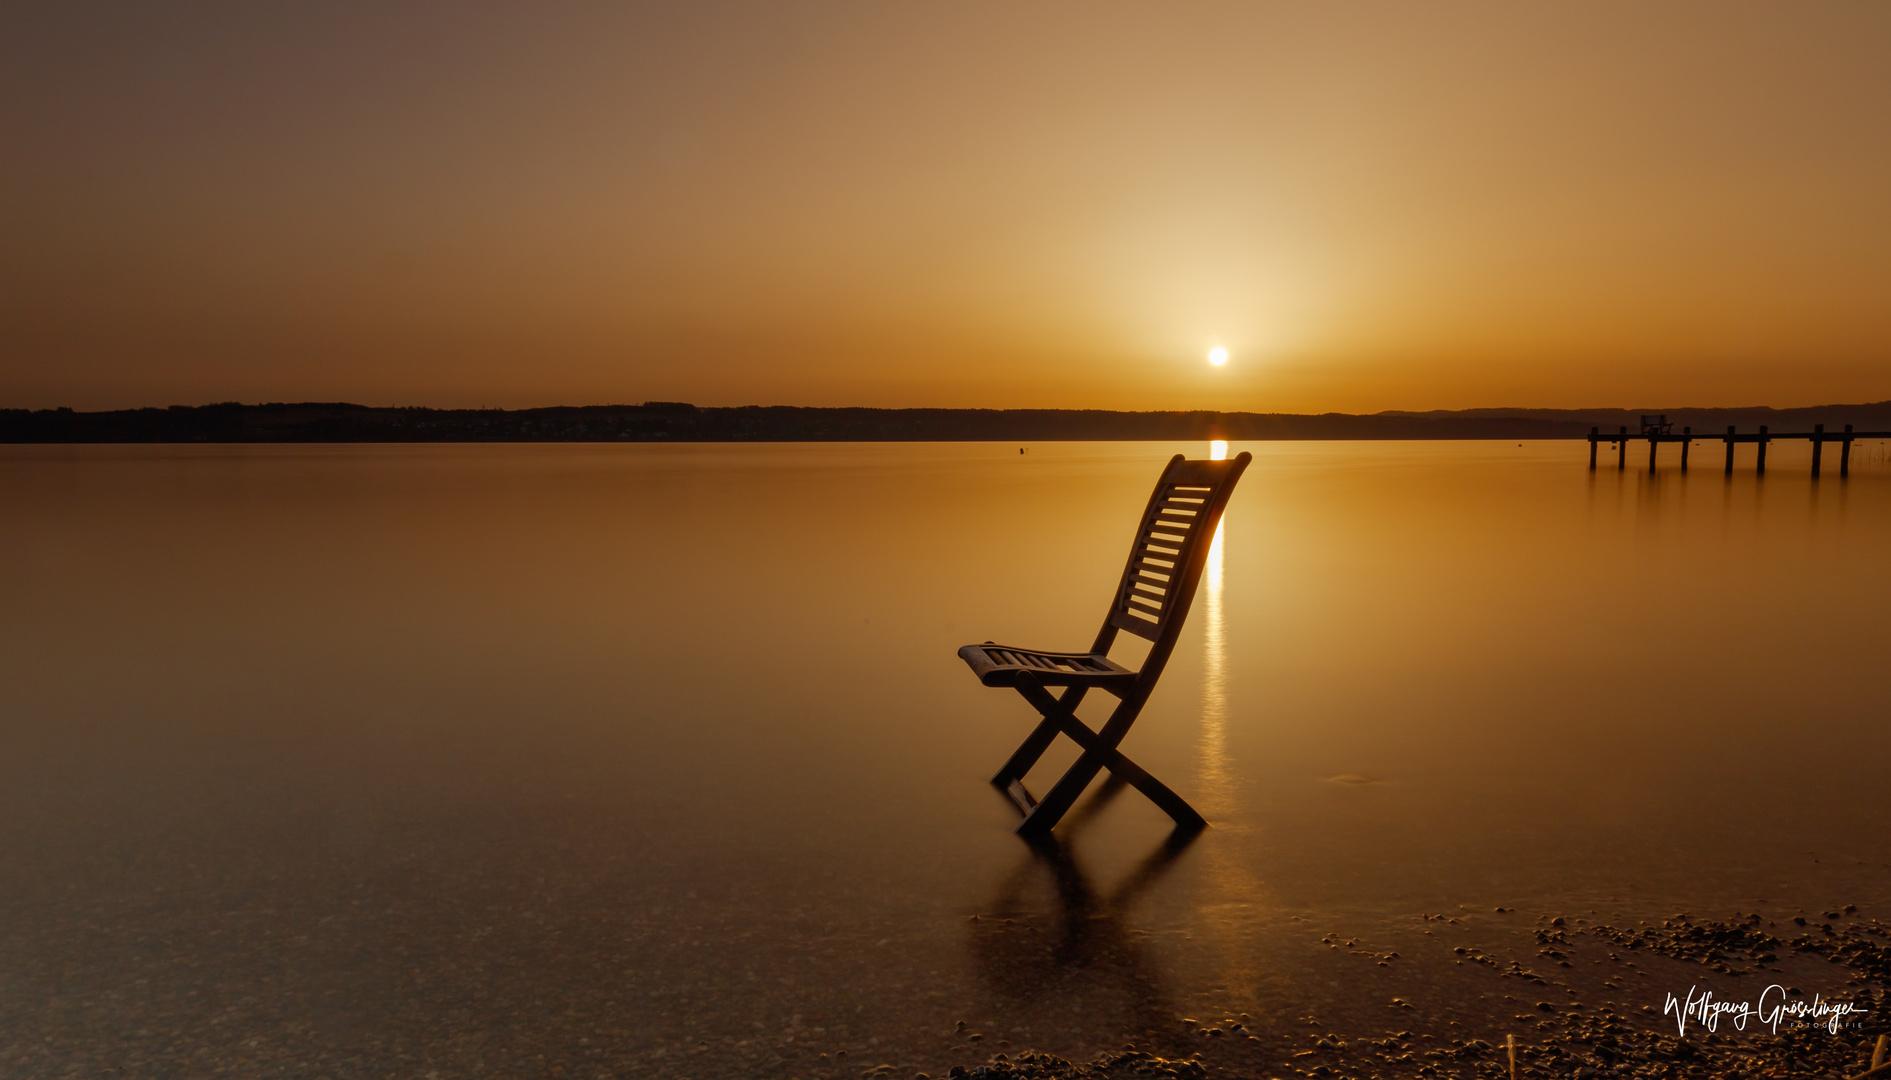 Sonnenaufgang mit den Saharasand Farben